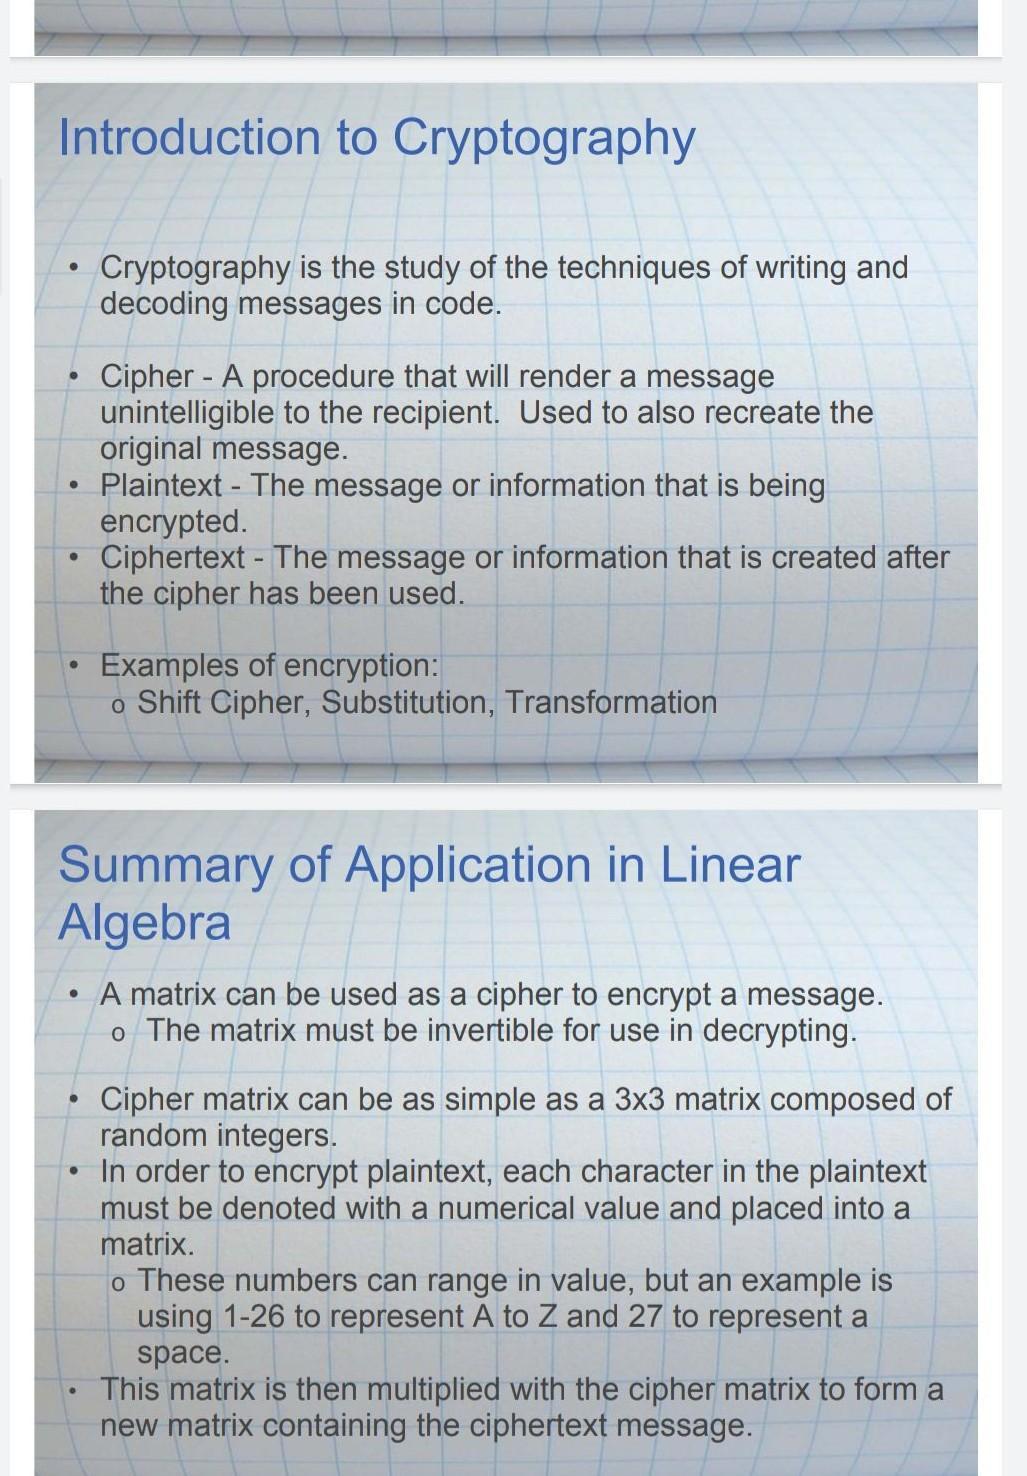 Encode the message 'SATEESH' using linear algebra ...